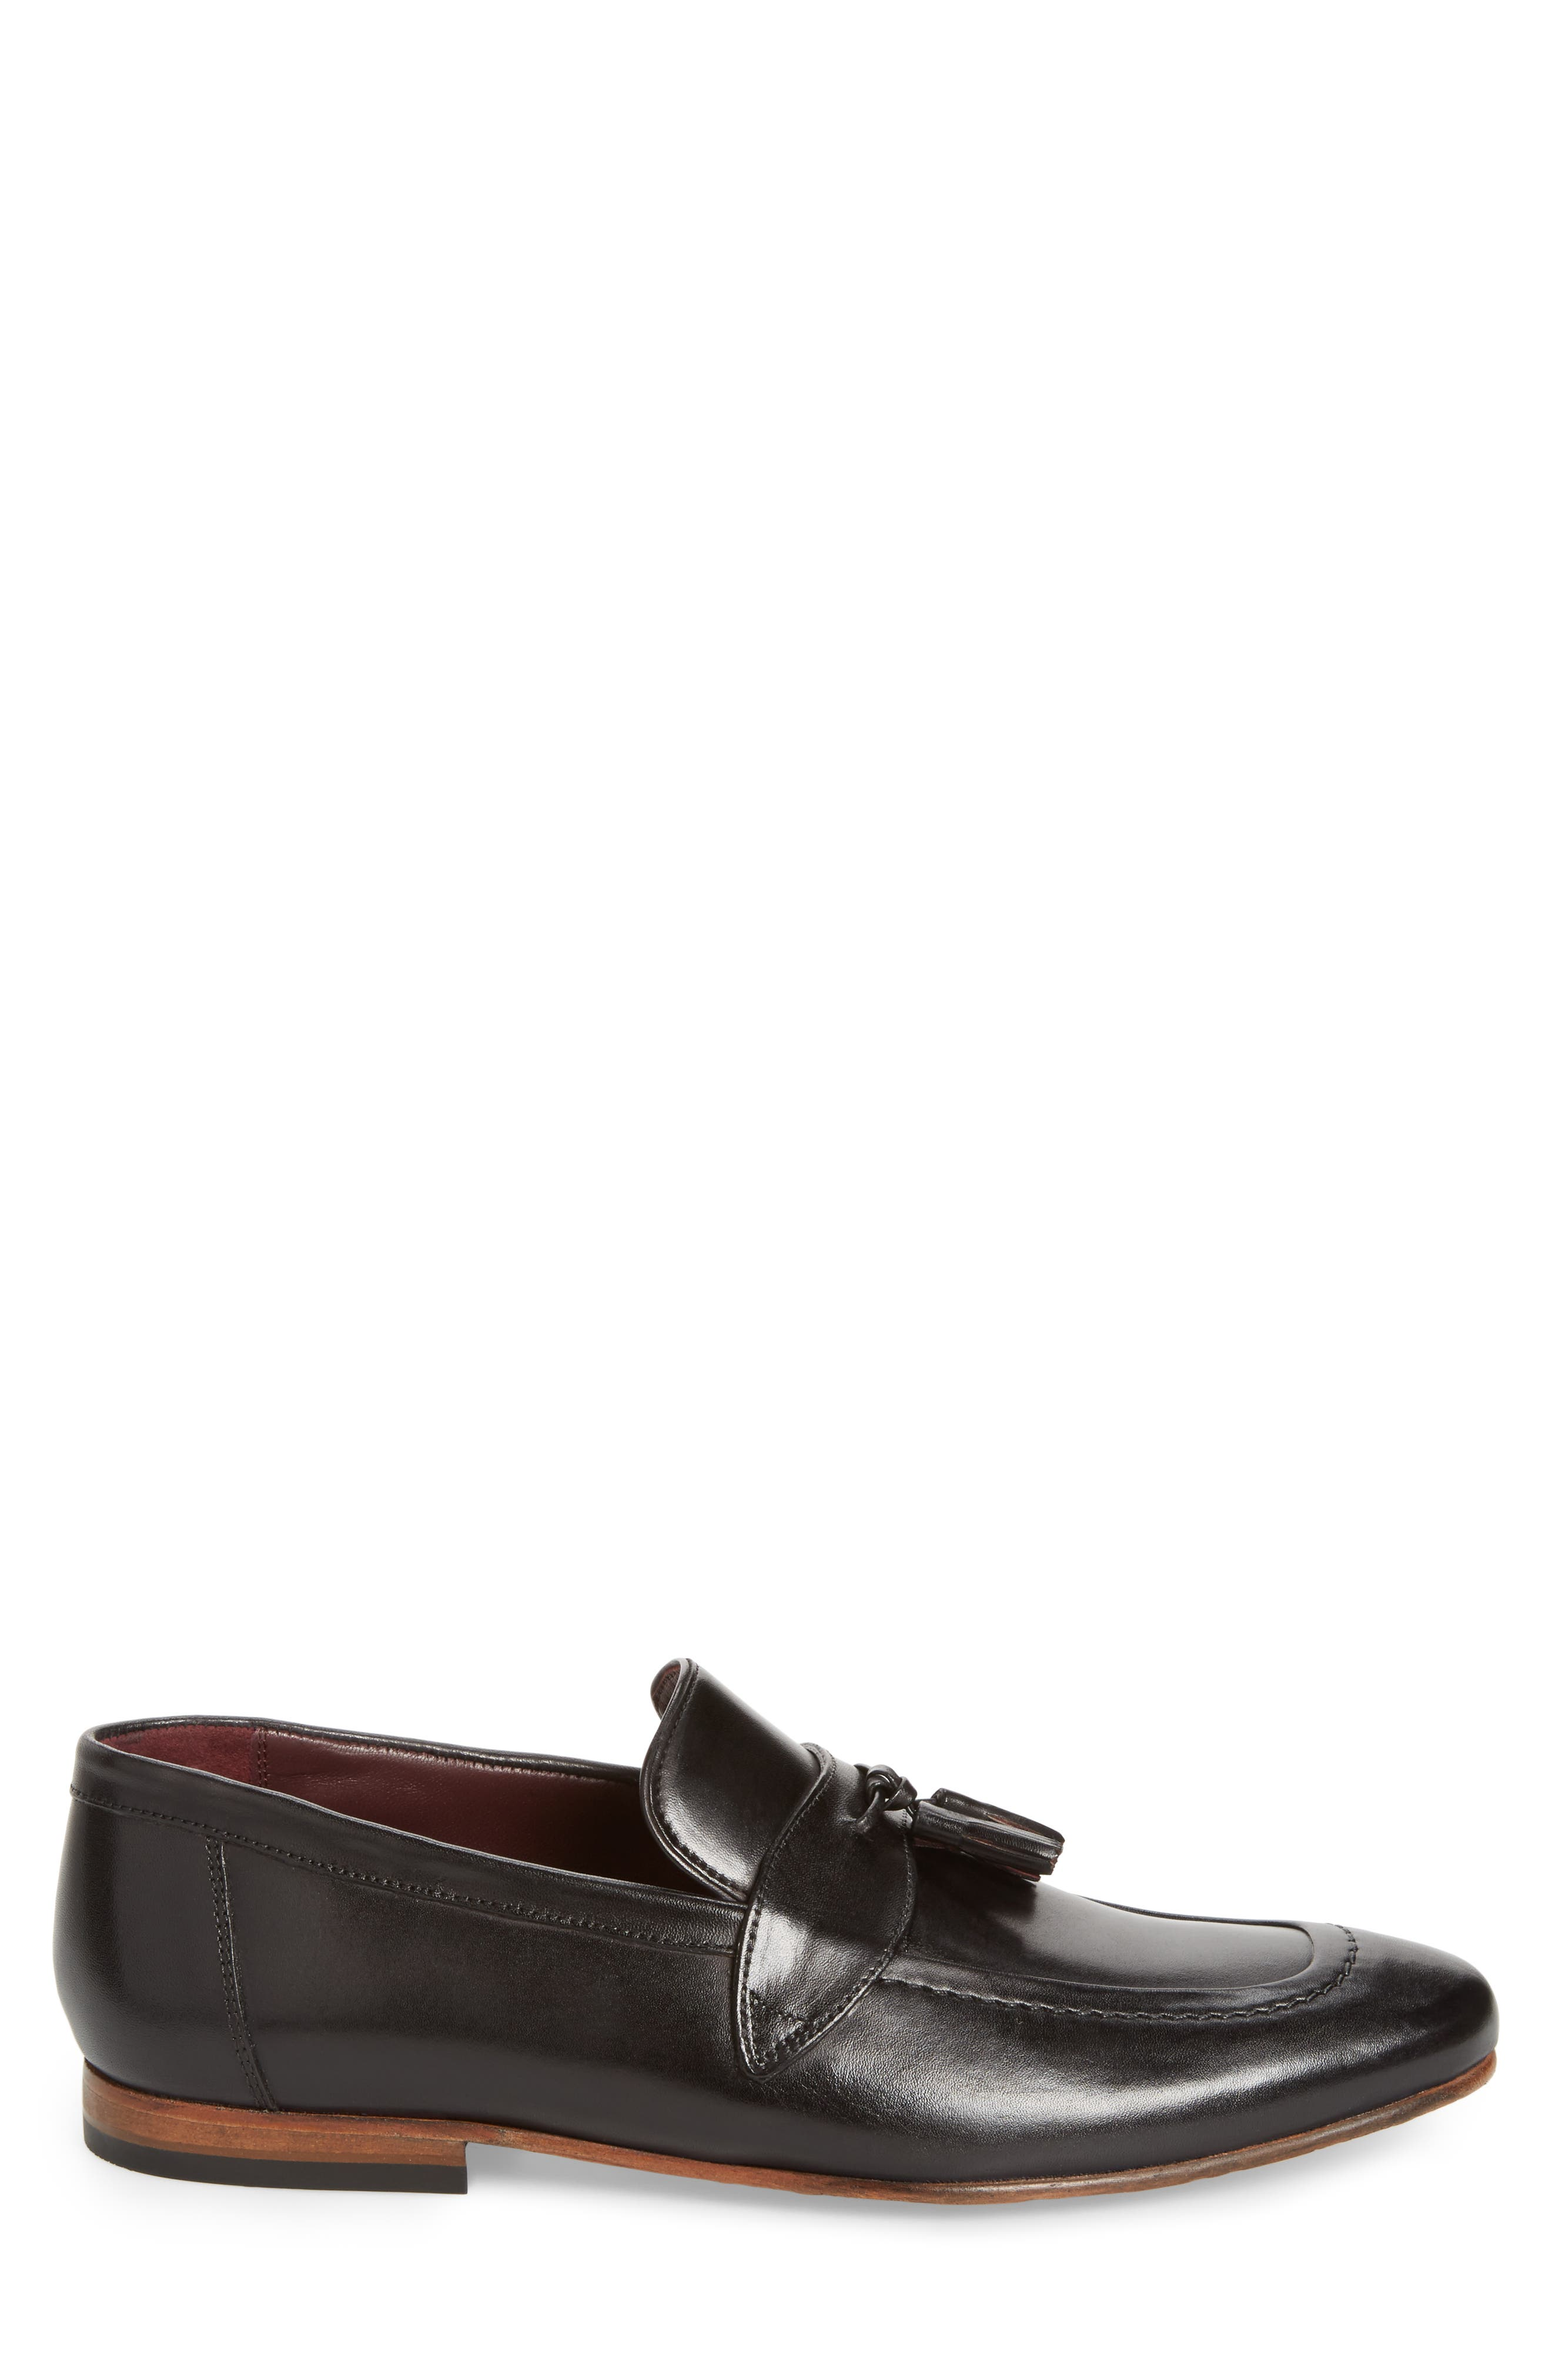 Grafit Tassel Loafer,                             Alternate thumbnail 6, color,                             Black Leather